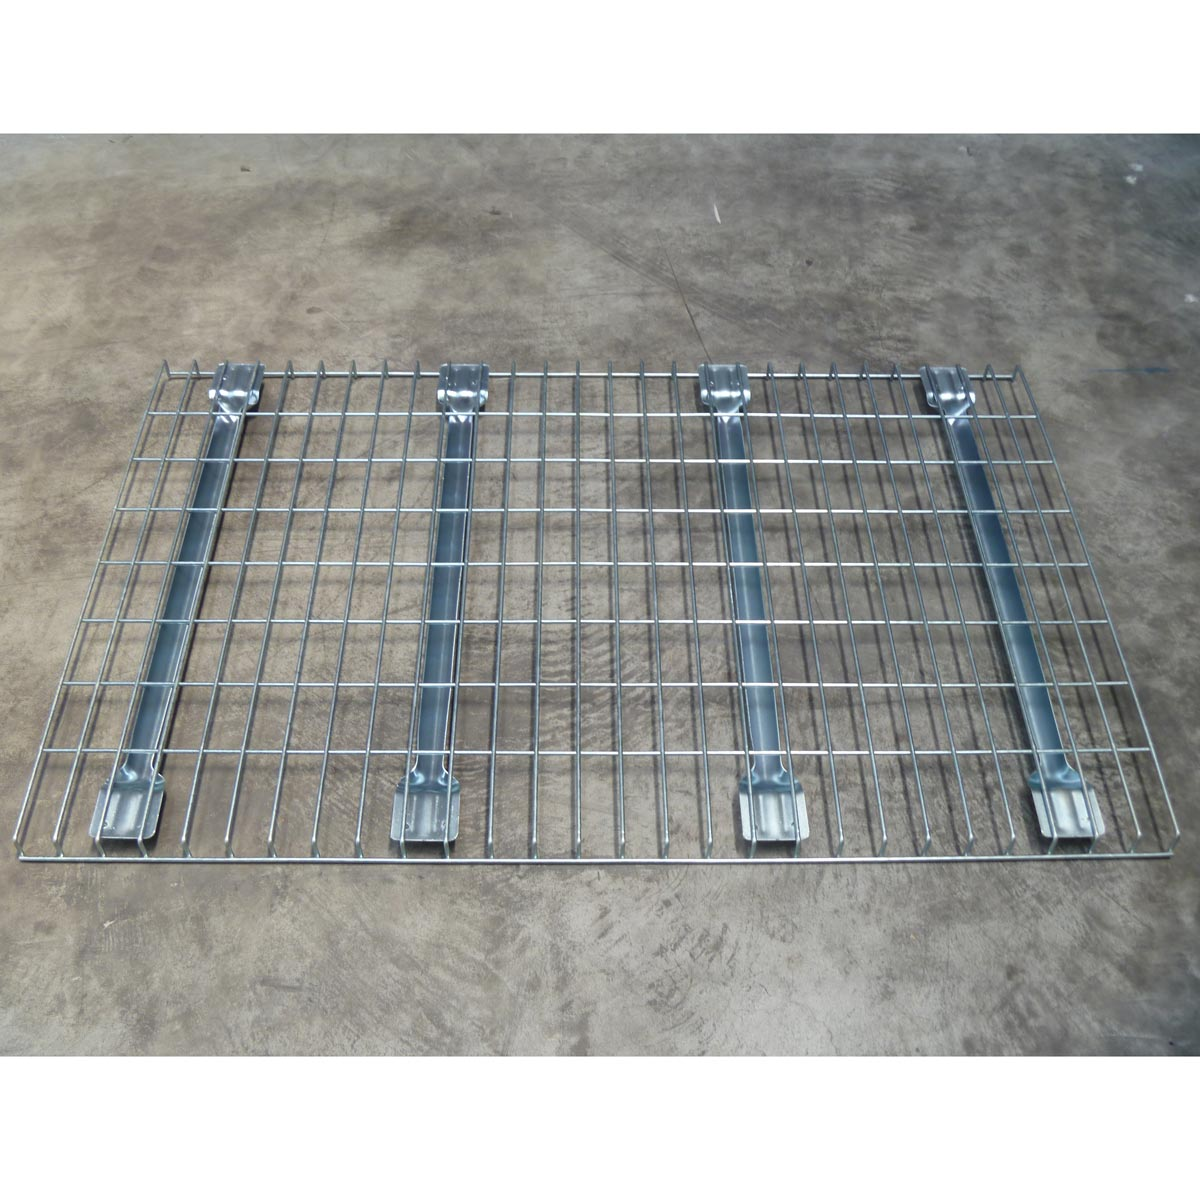 1pcs Mesh Deck for Pallet Racking.